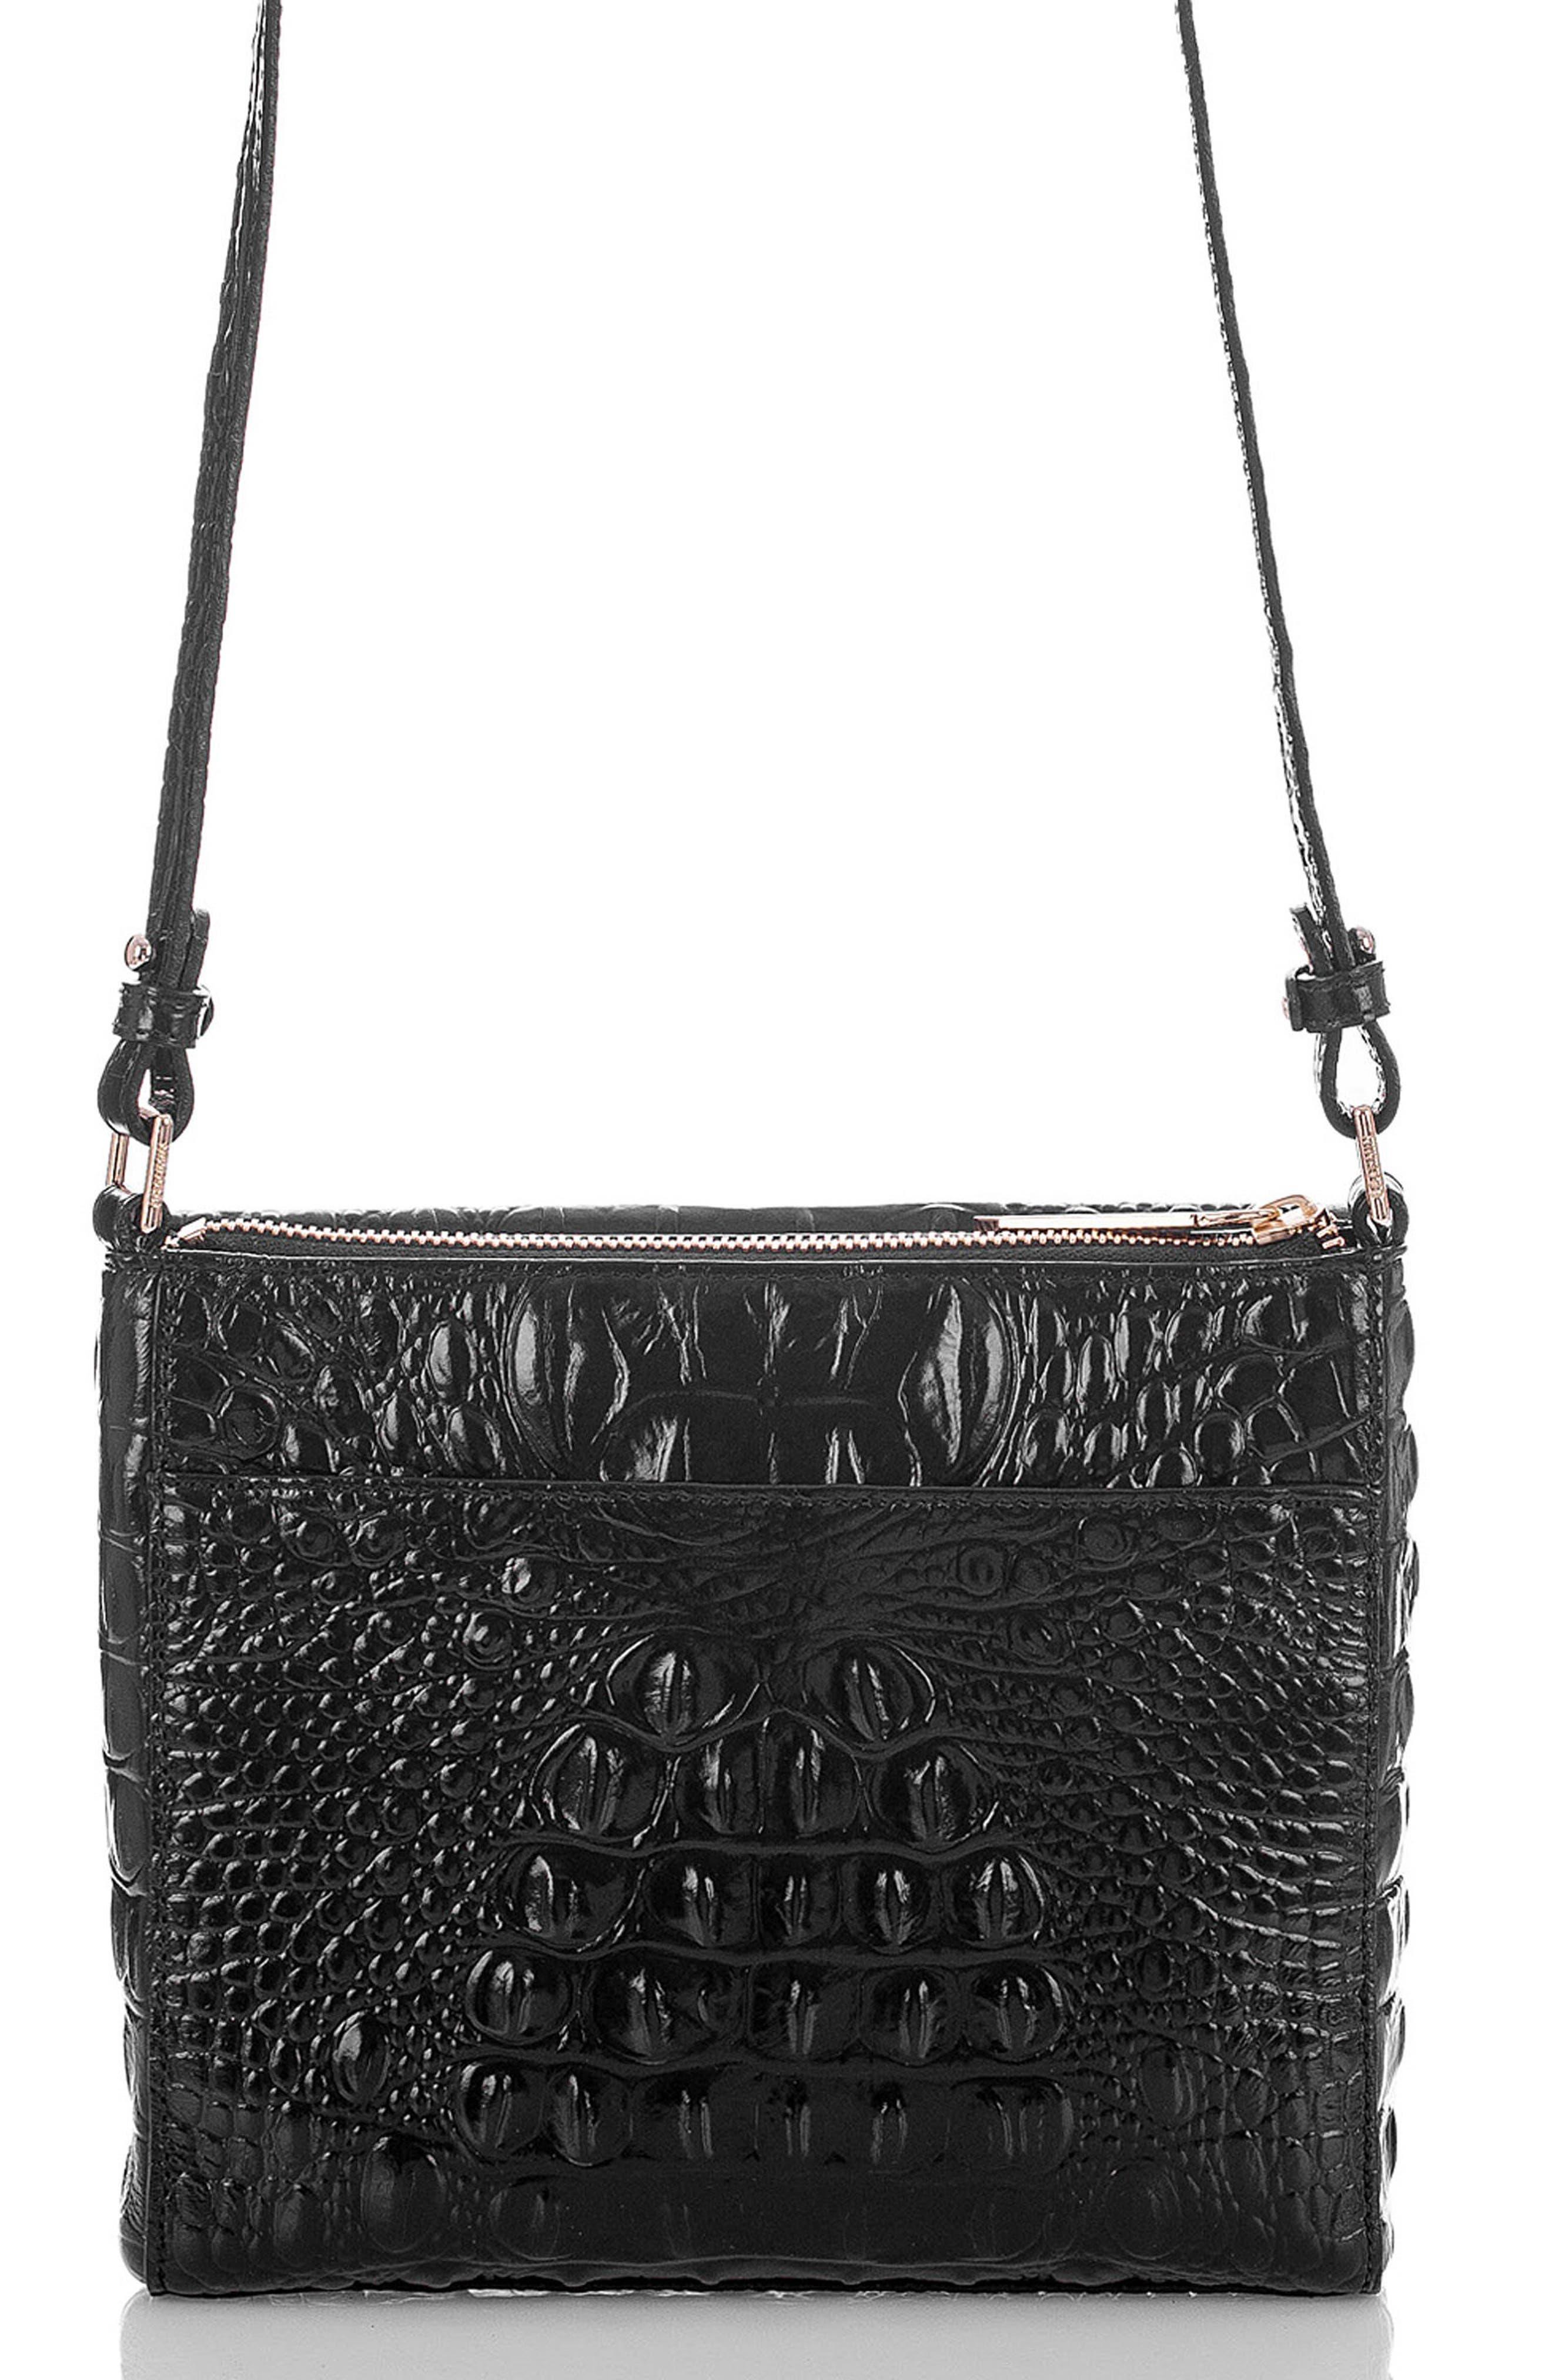 Melbourne Manhattan Croc Embossed Leather Crossbody Bag,                             Alternate thumbnail 3, color,                             BLACK